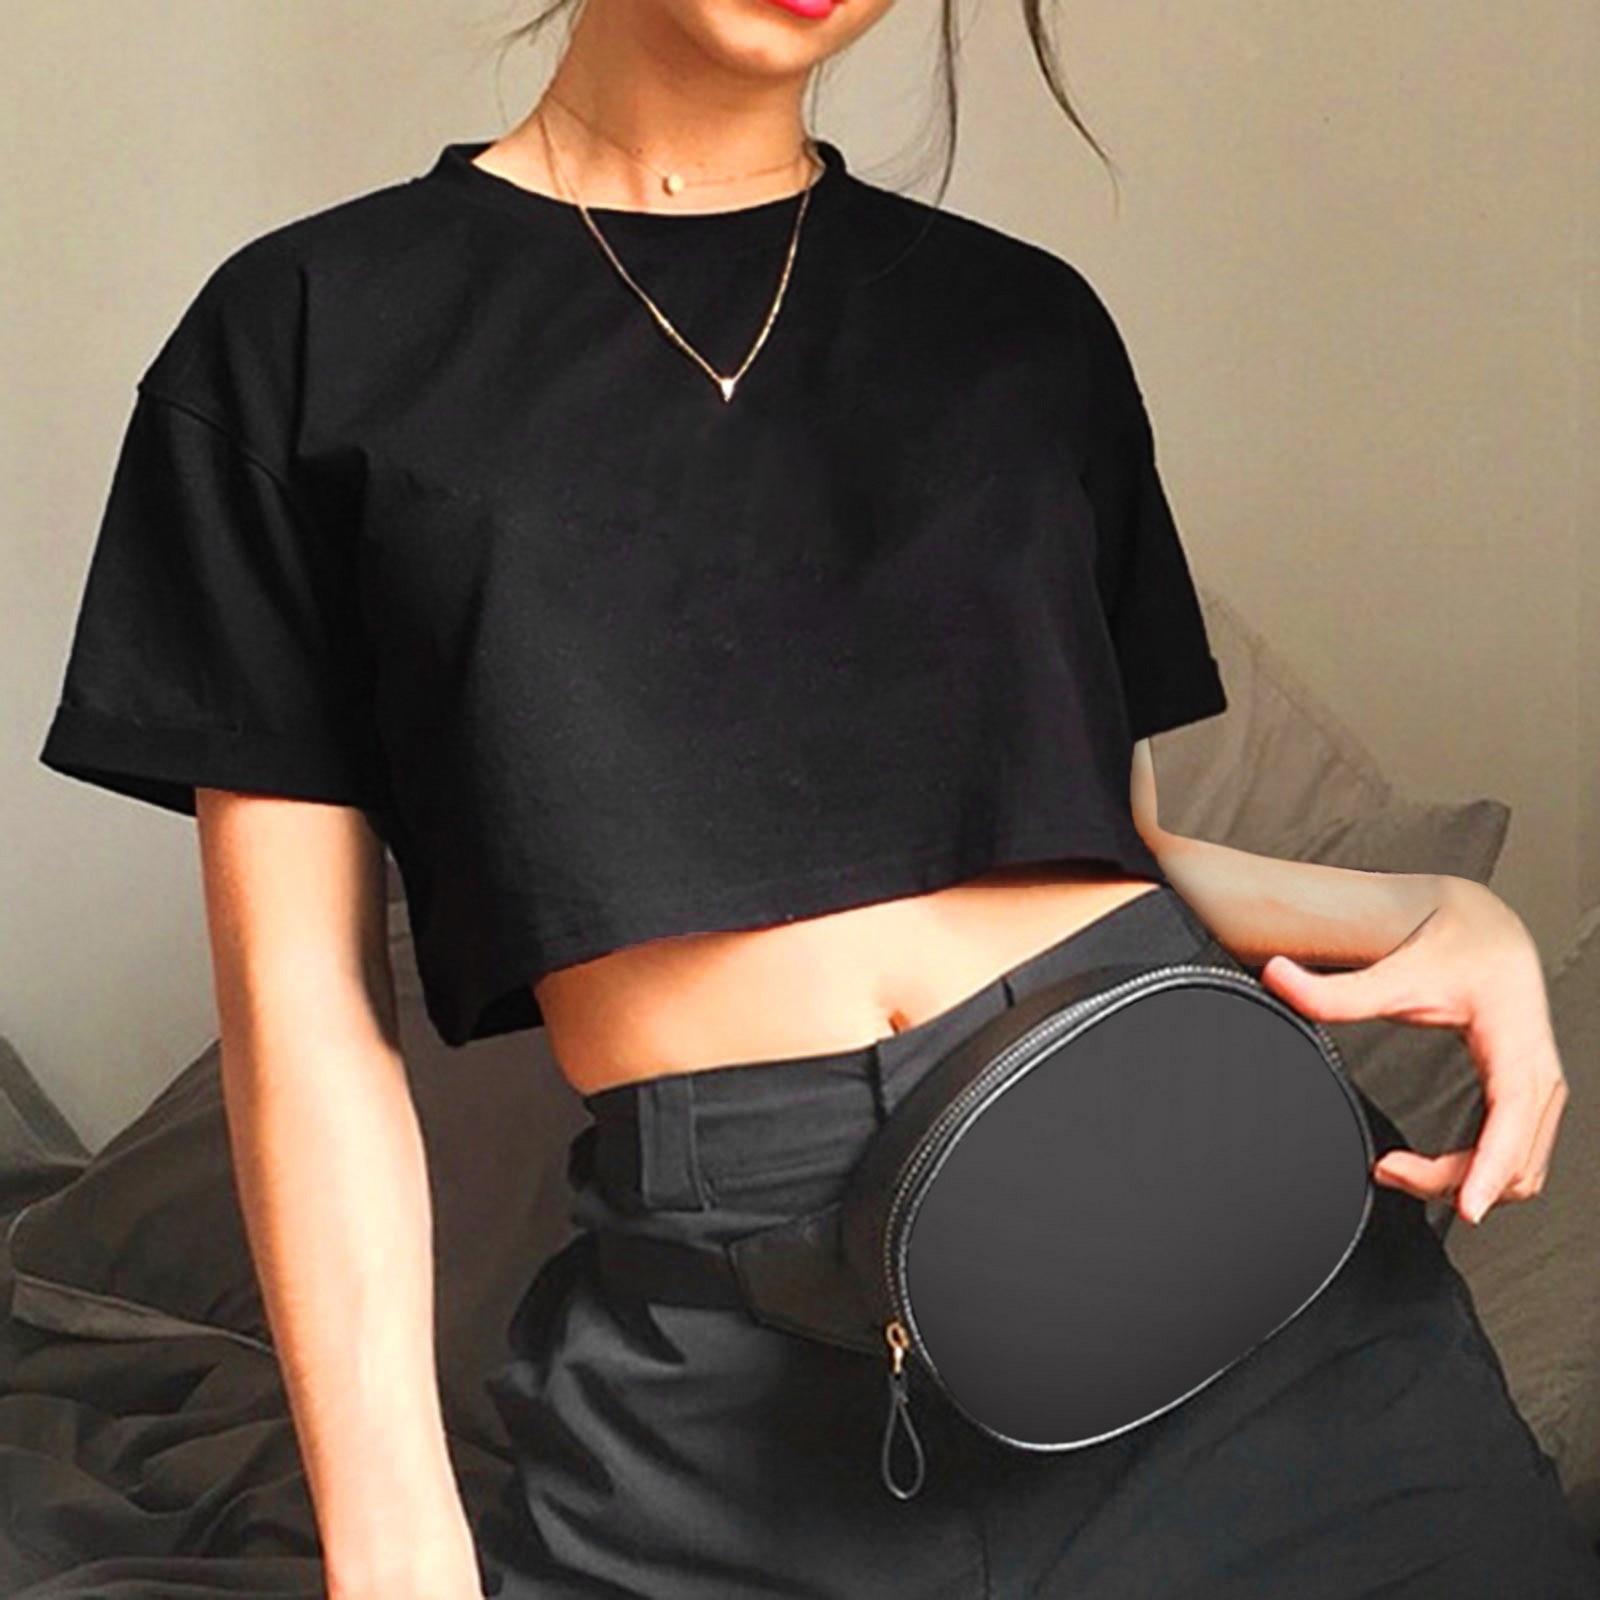 aliexpress - Harajuku Funny Women Crop Tops Casual Black Femme Navel T-shirt Round Neck Short Loose Tee Shirt Summer Streetwear